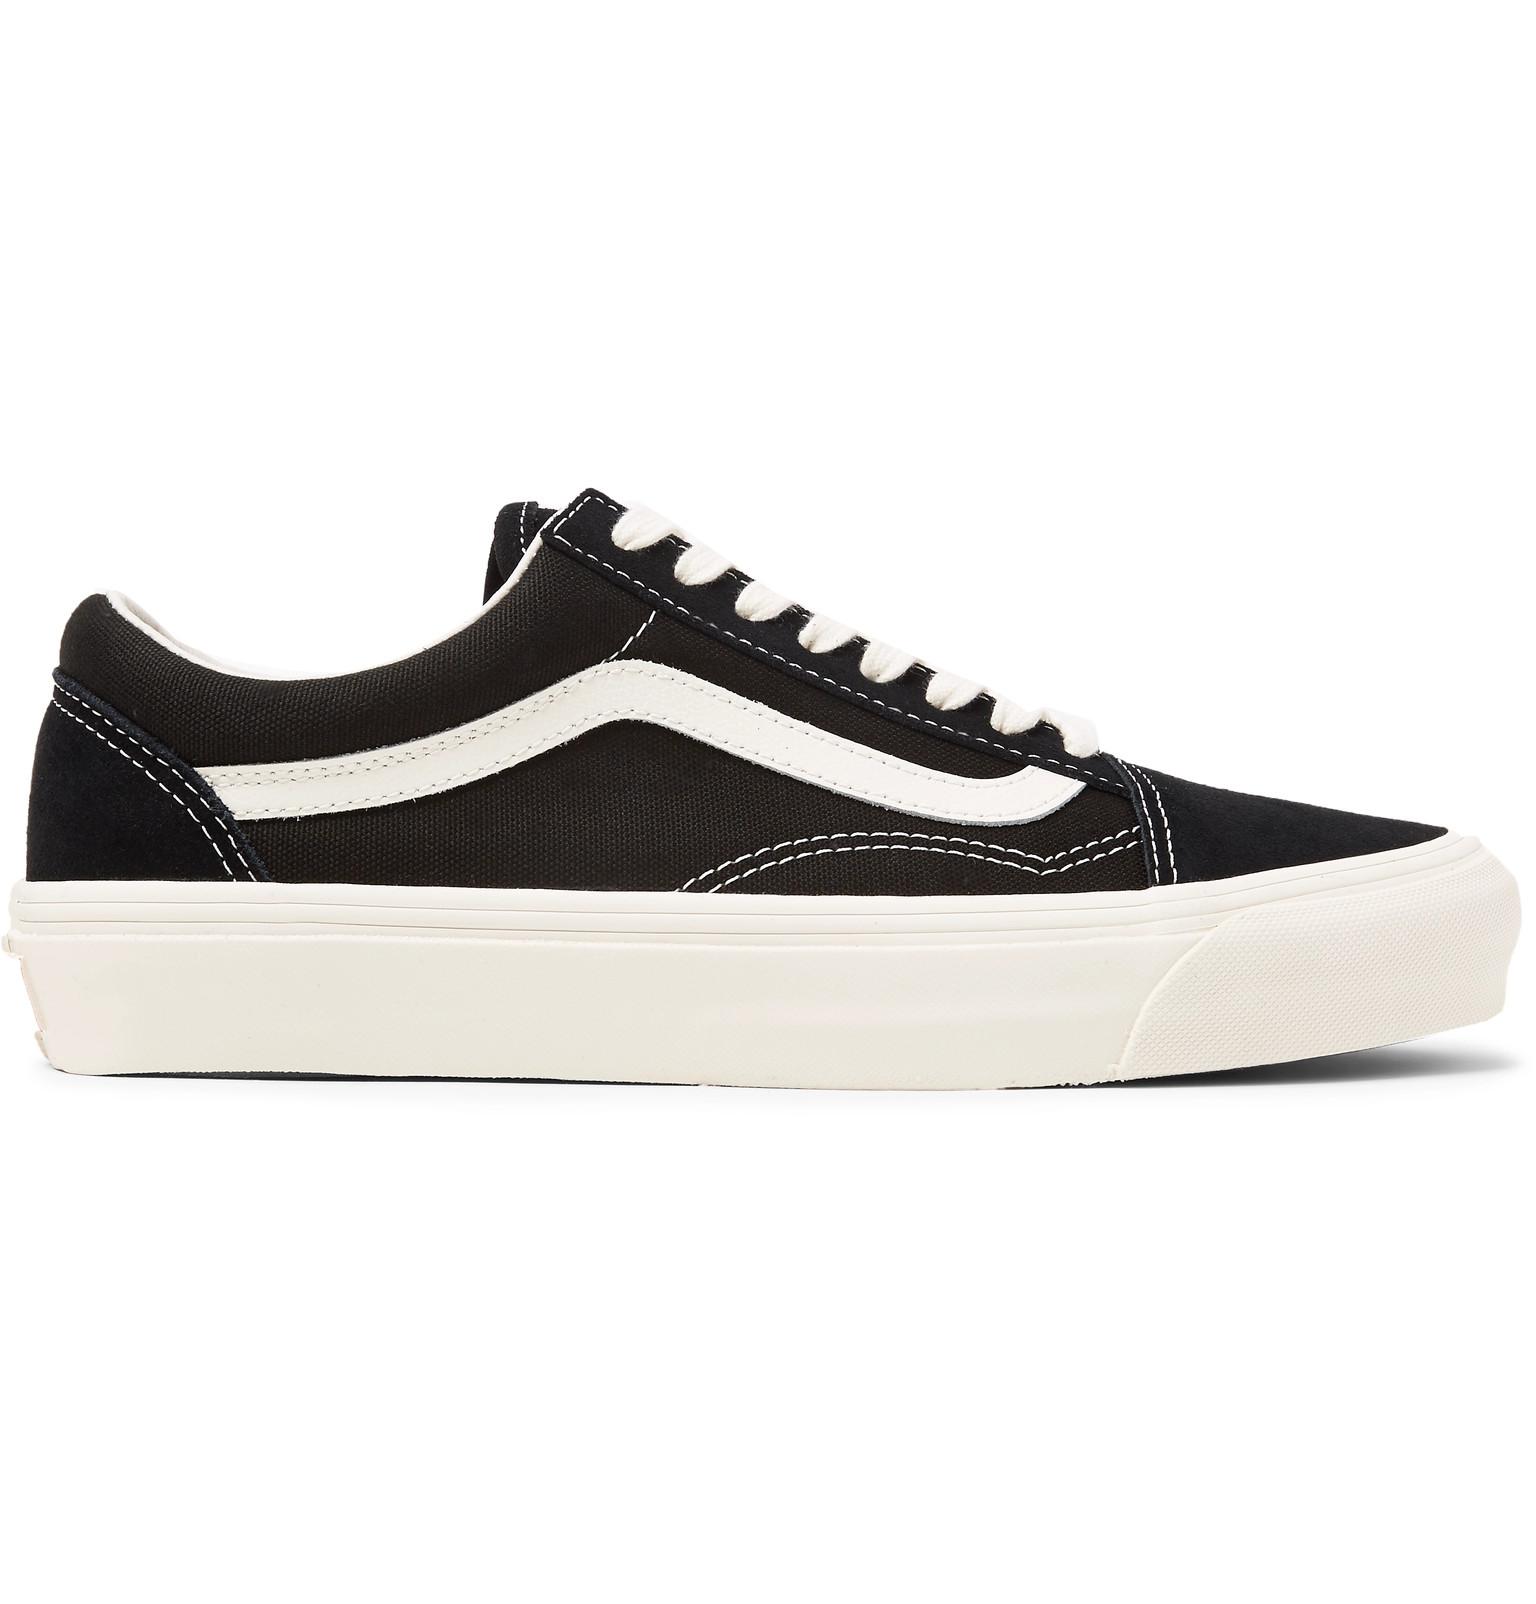 bebd81ab1c Vans - OG Old Skool LX Leather-Trimmed Canvas and Suede Sneakers